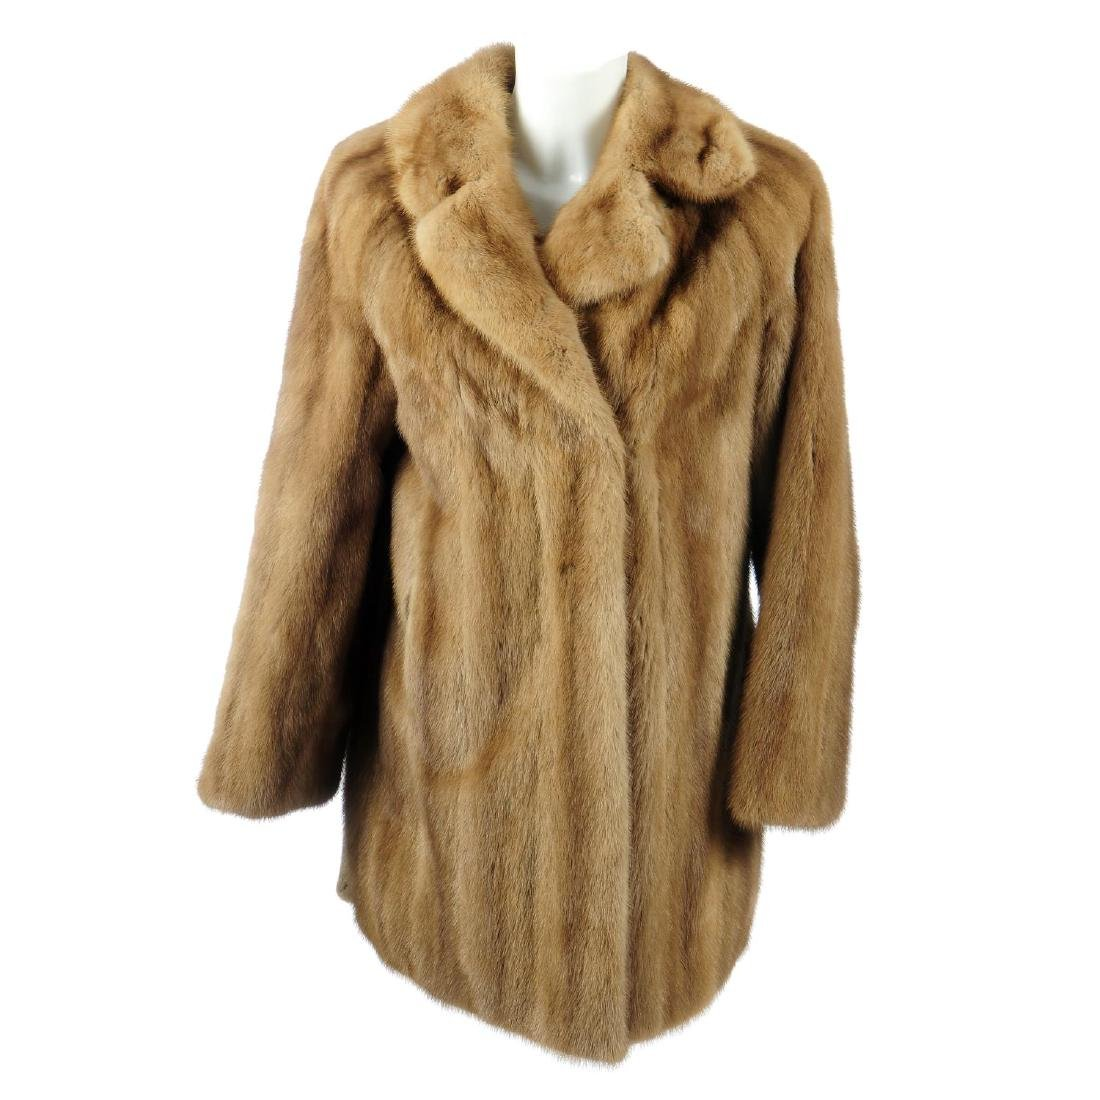 A palomino mink three-quarter length coat. Featuring a